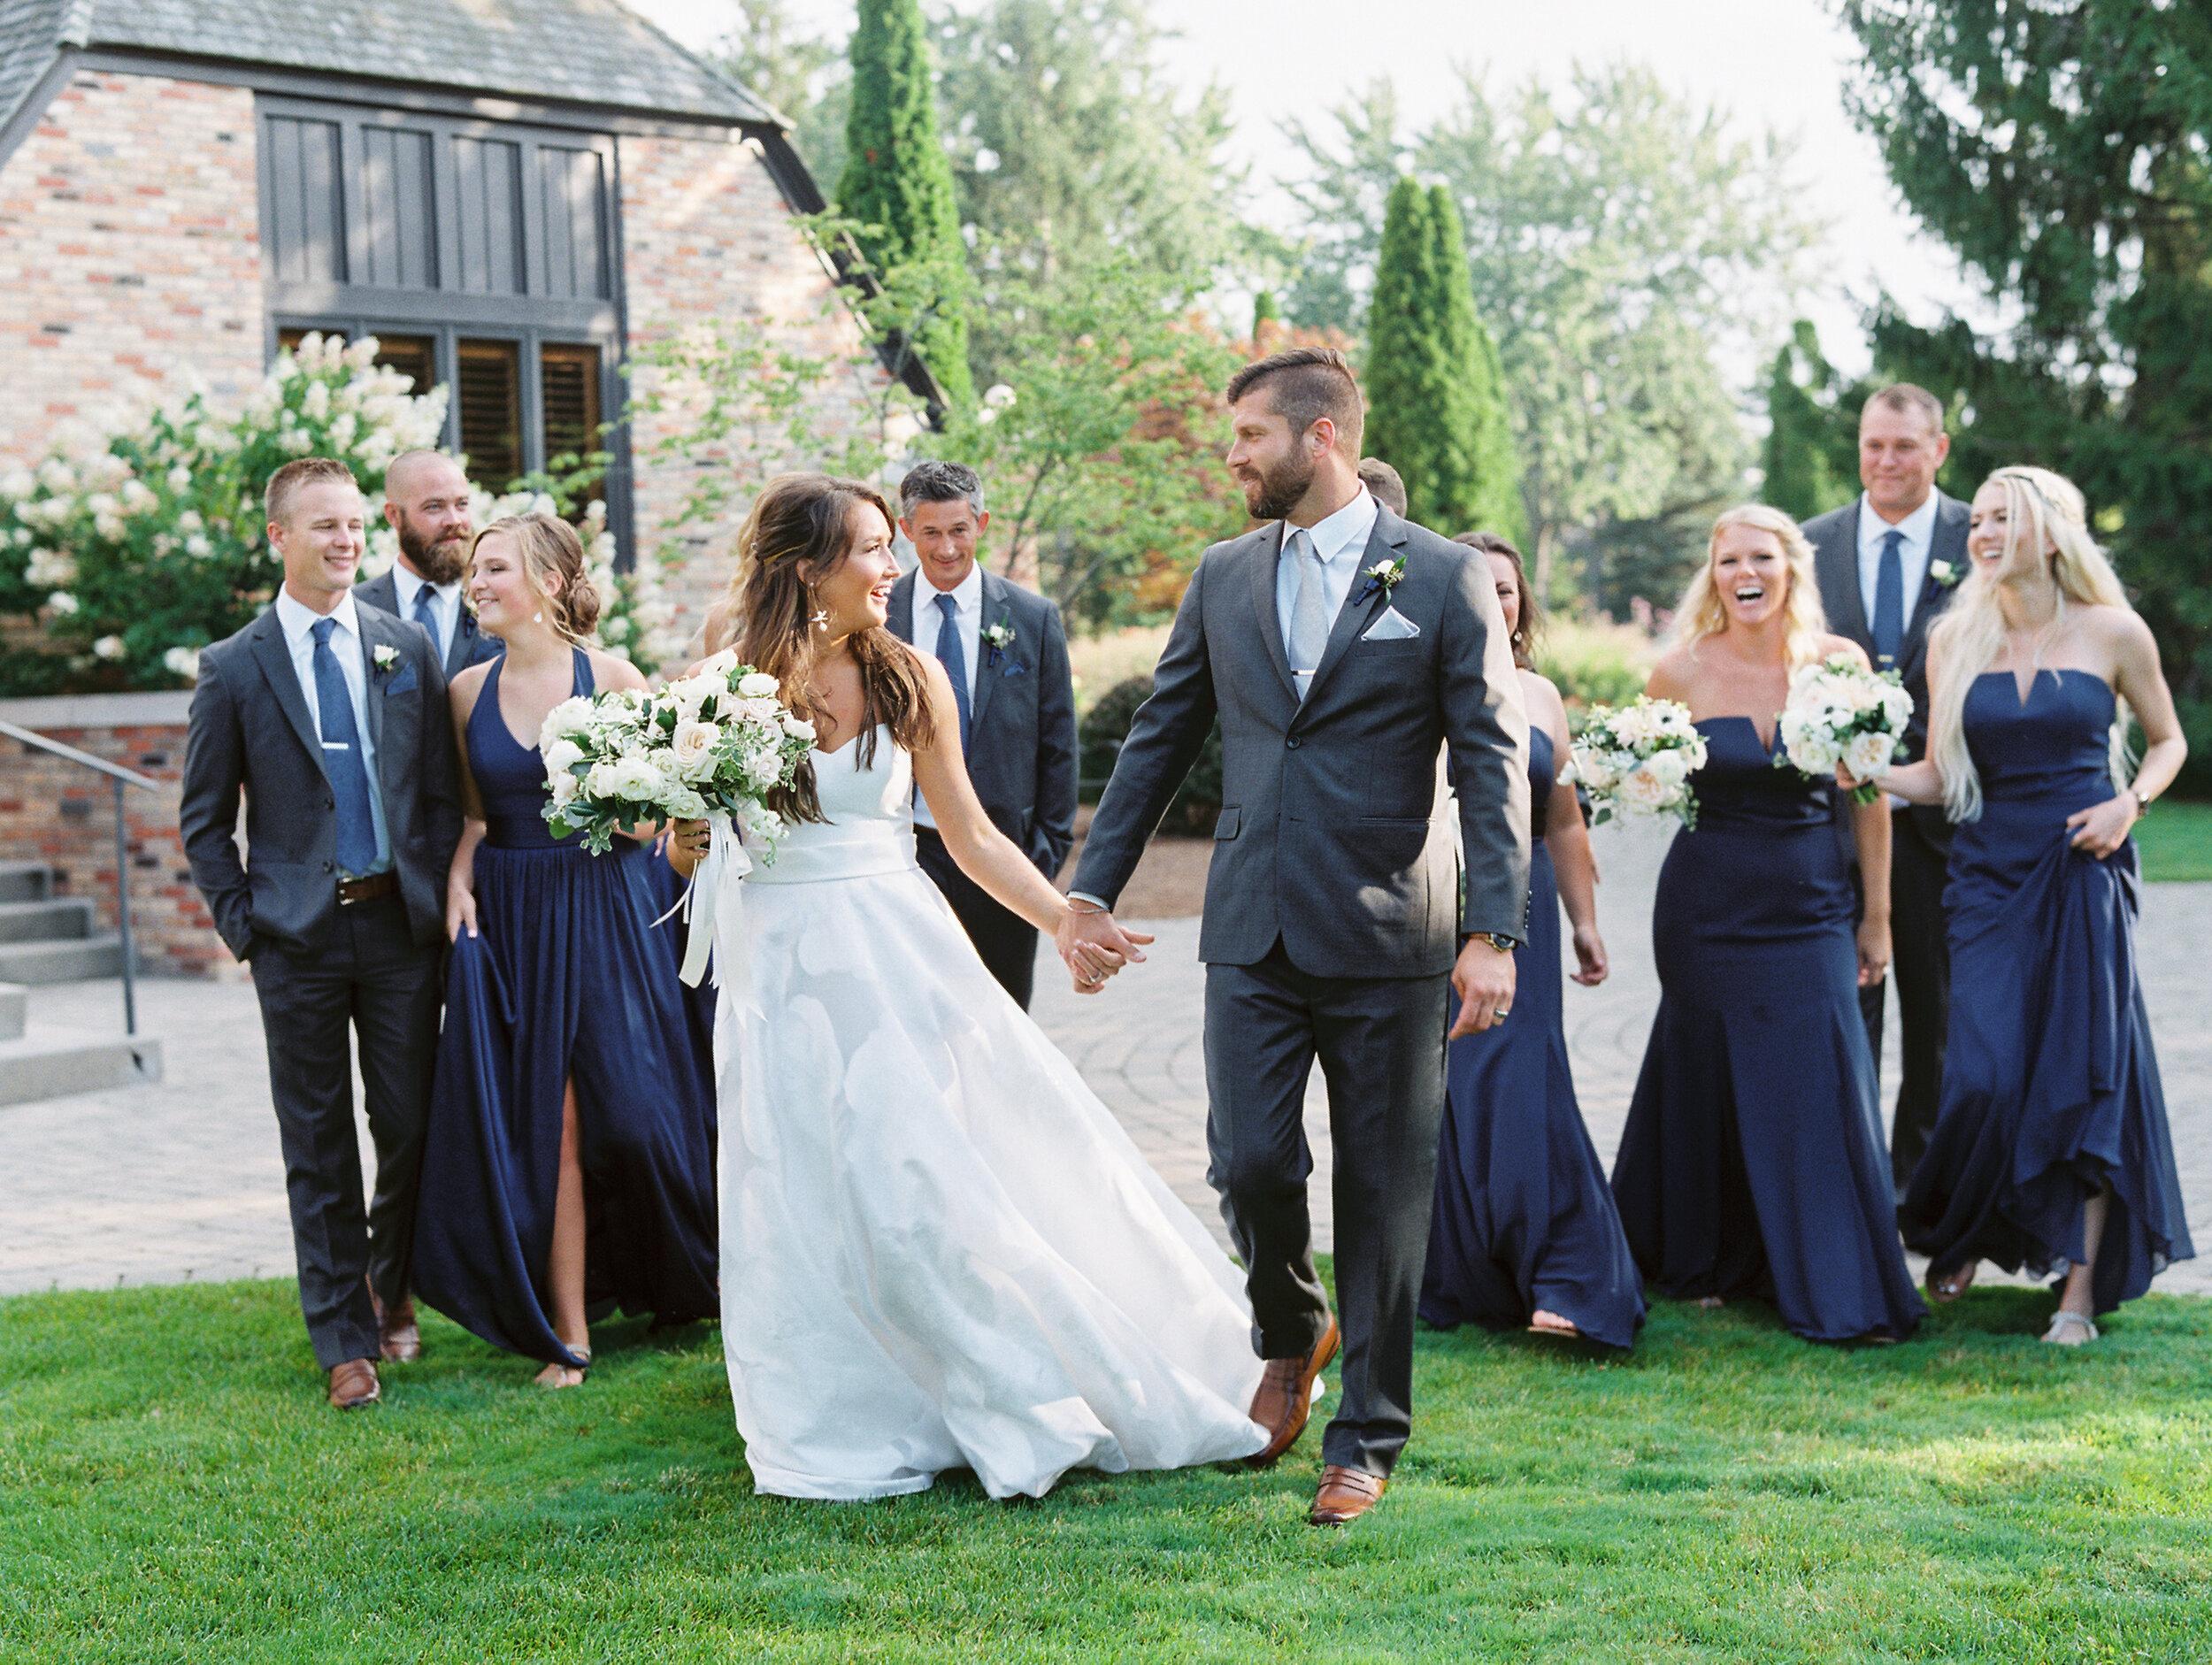 Kuiper+Wedding+Reception+Bridal+Party-117.jpg